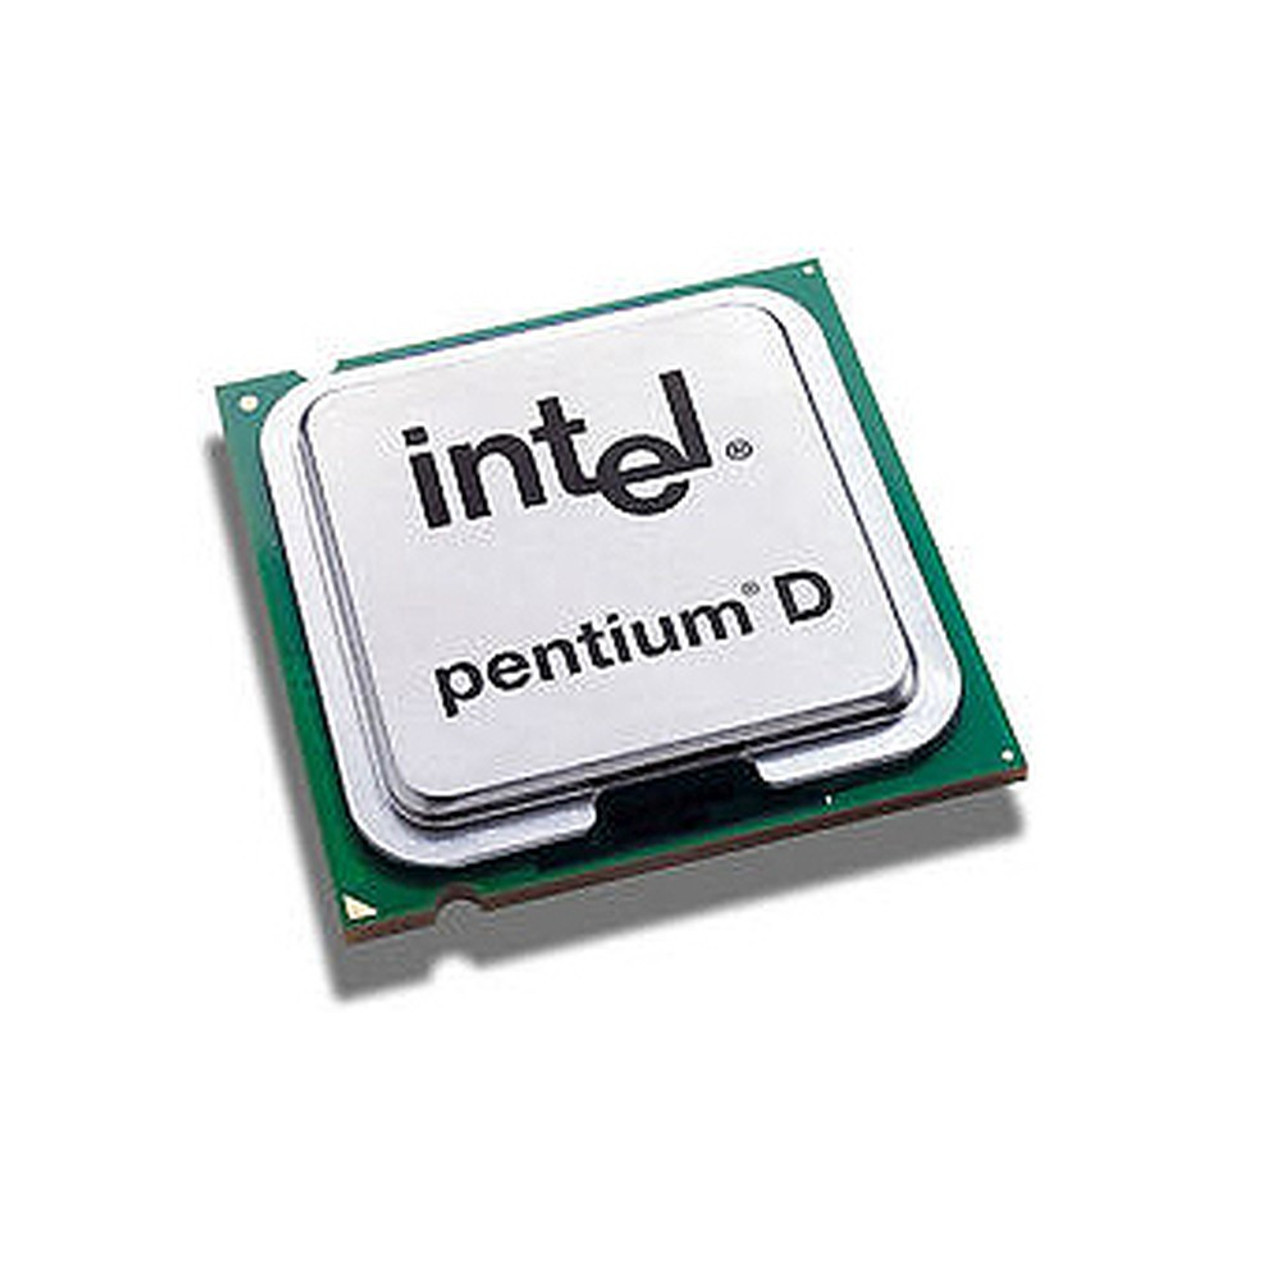 INTEL R PENTIUM R D CPU 2.80 GHZ LAN WINDOWS 10 DRIVERS